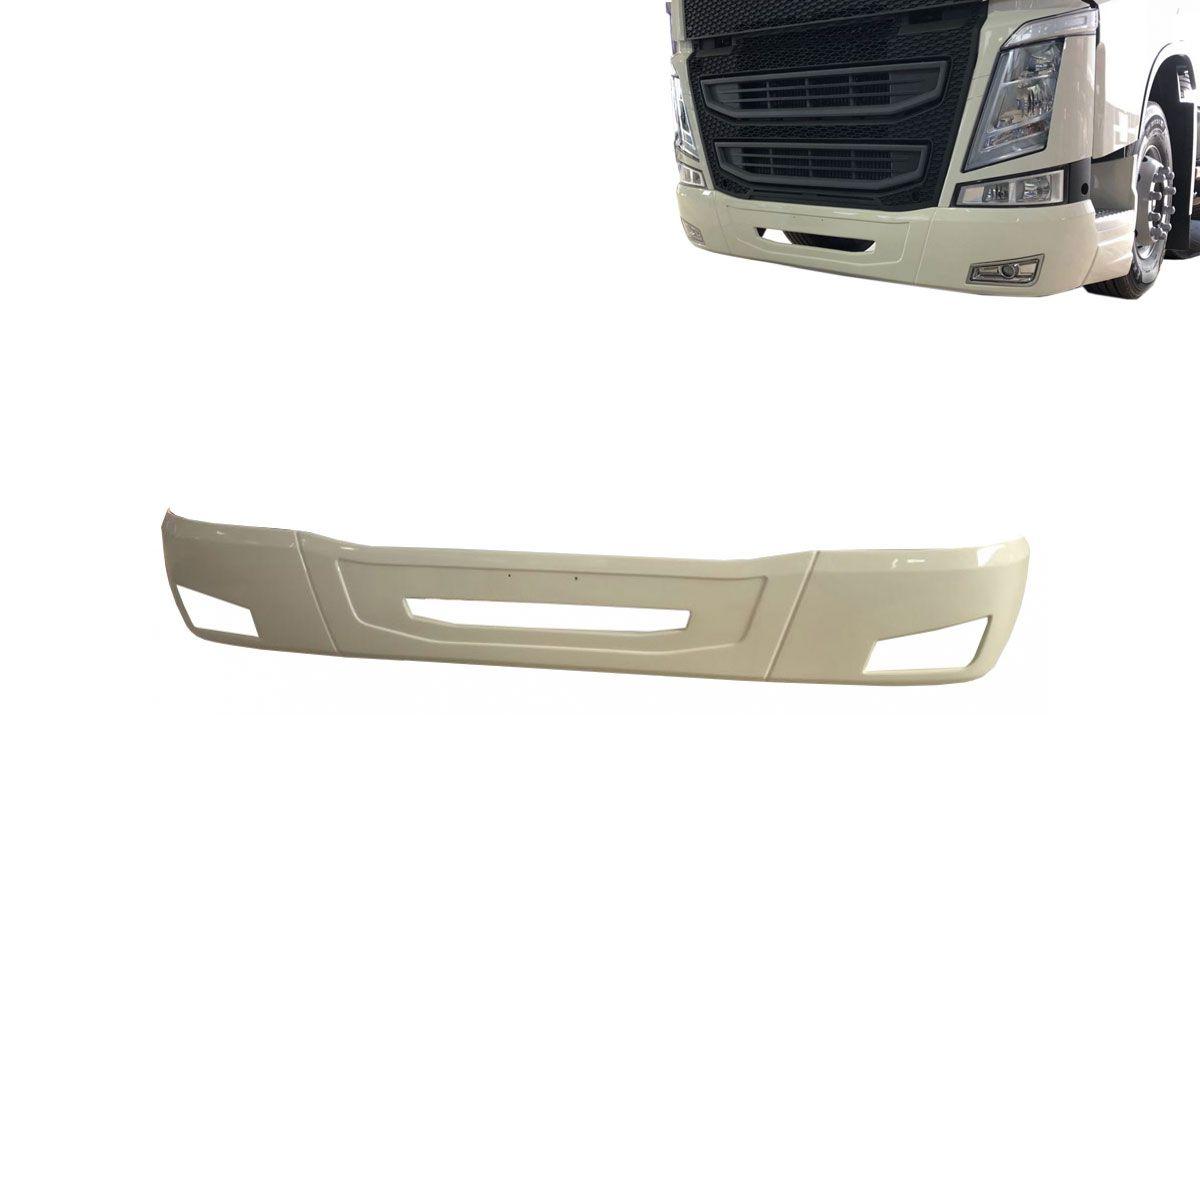 Capa de Parachoque Volvo New FH Aberta + Par Farol Auxiliar